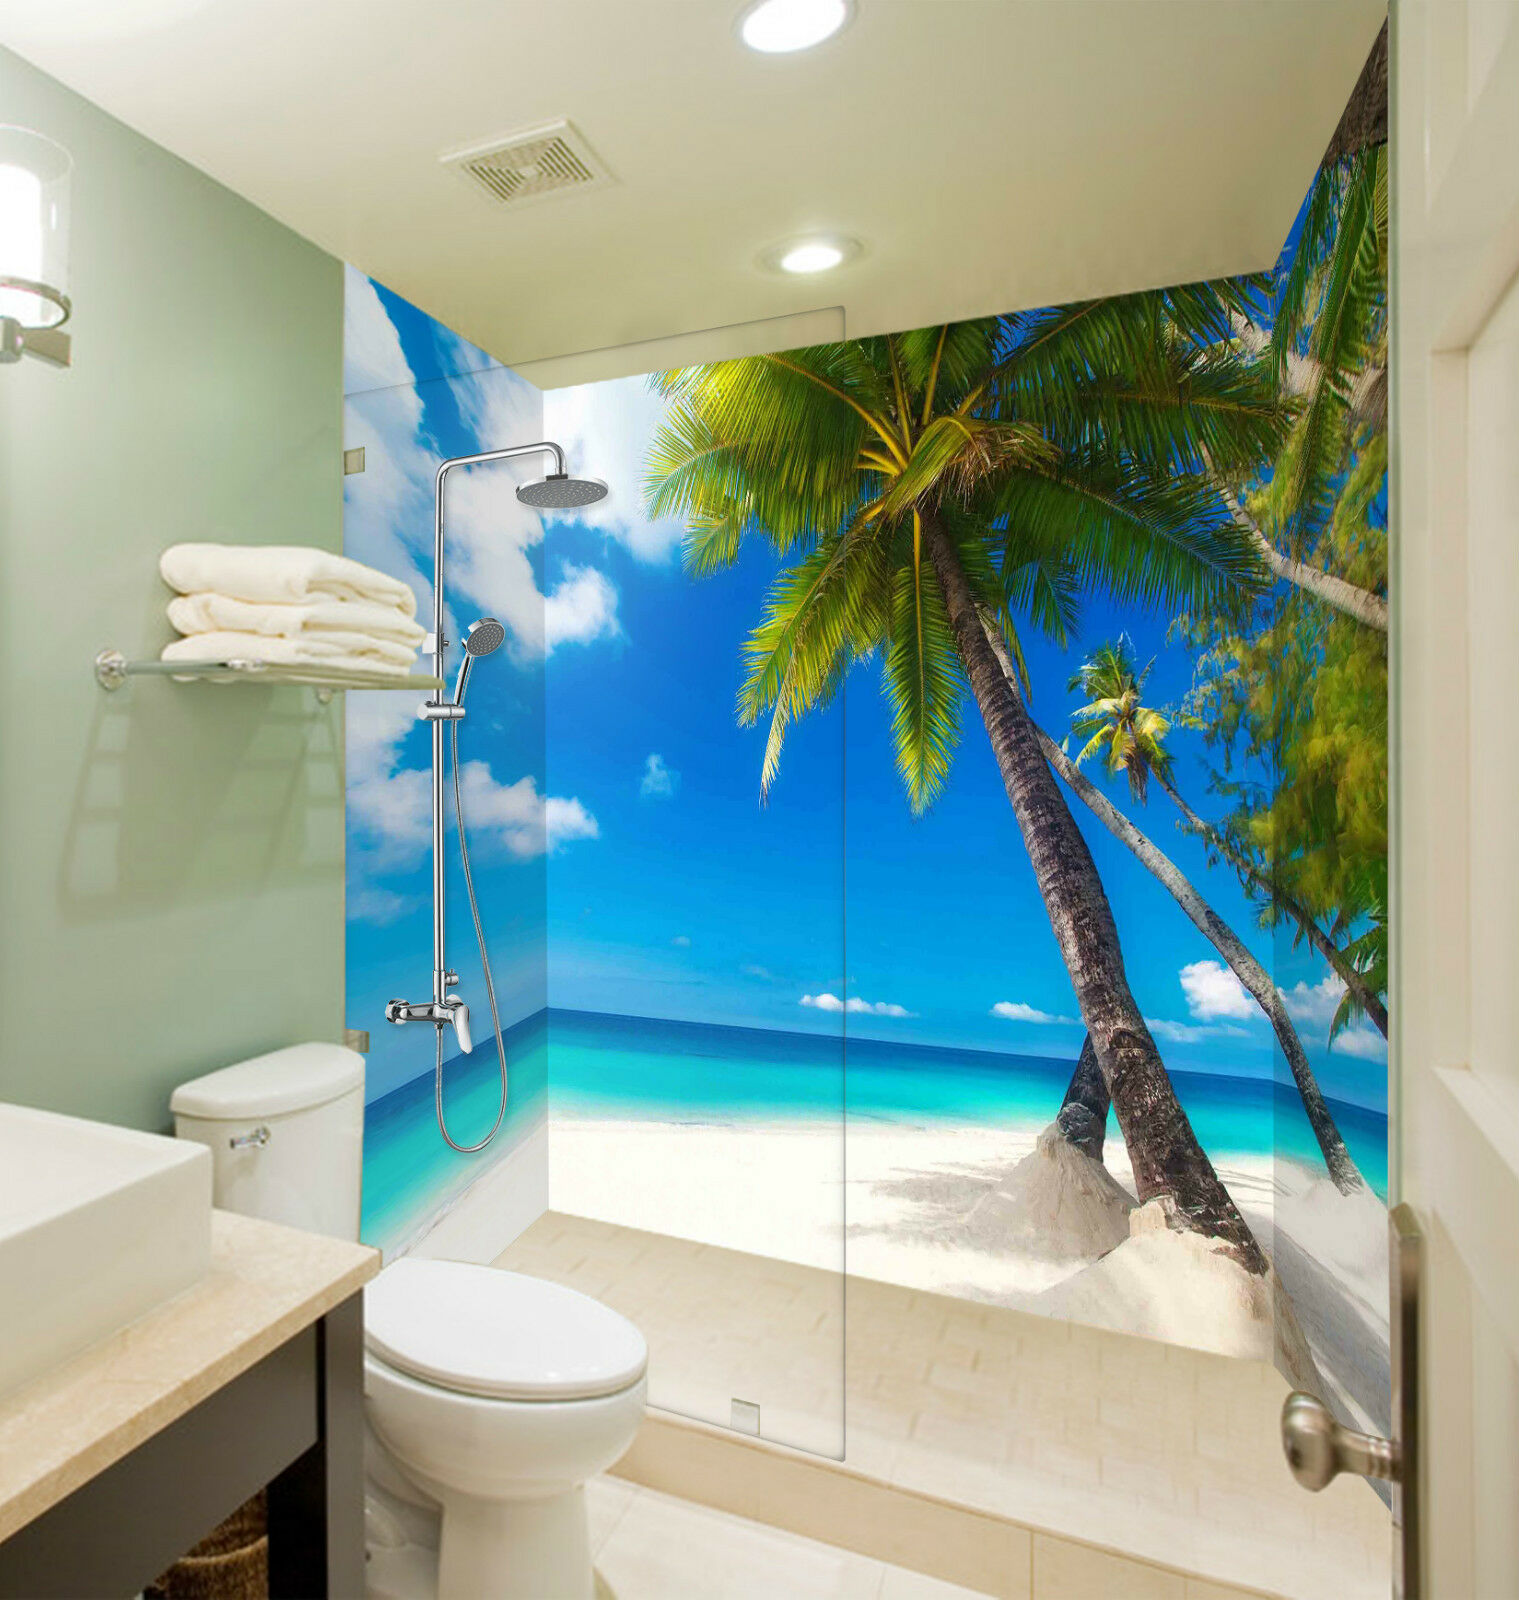 3D Beach Scenery 071 WallPaper Bathroom Print Decal Wall Deco AJ WALLPAPER CA